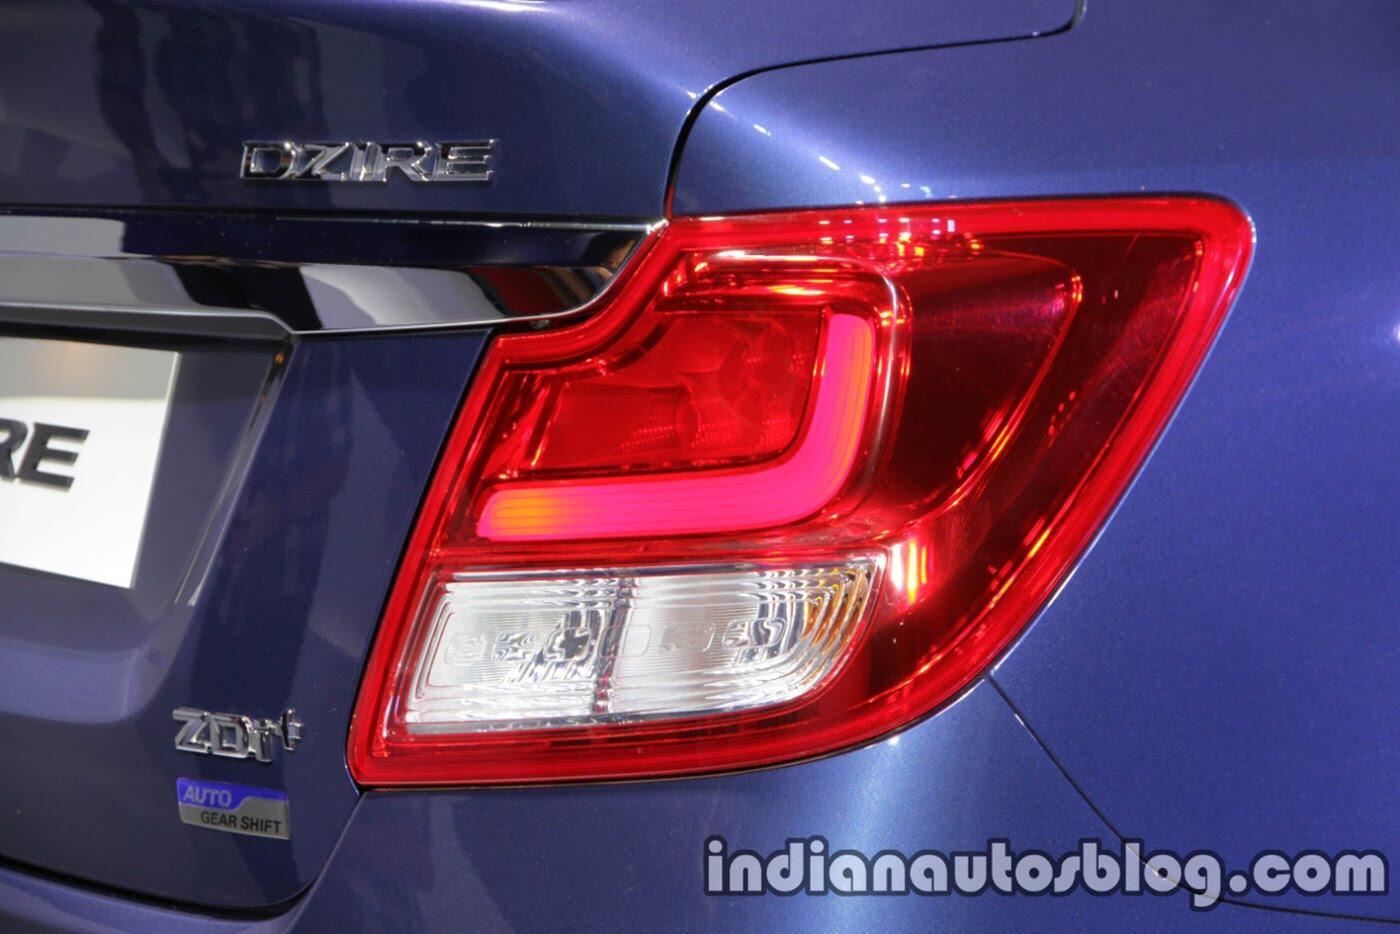 Xem thêm ảnh phiên bản sedan của Suzuki Swift 2018 - Hình 6